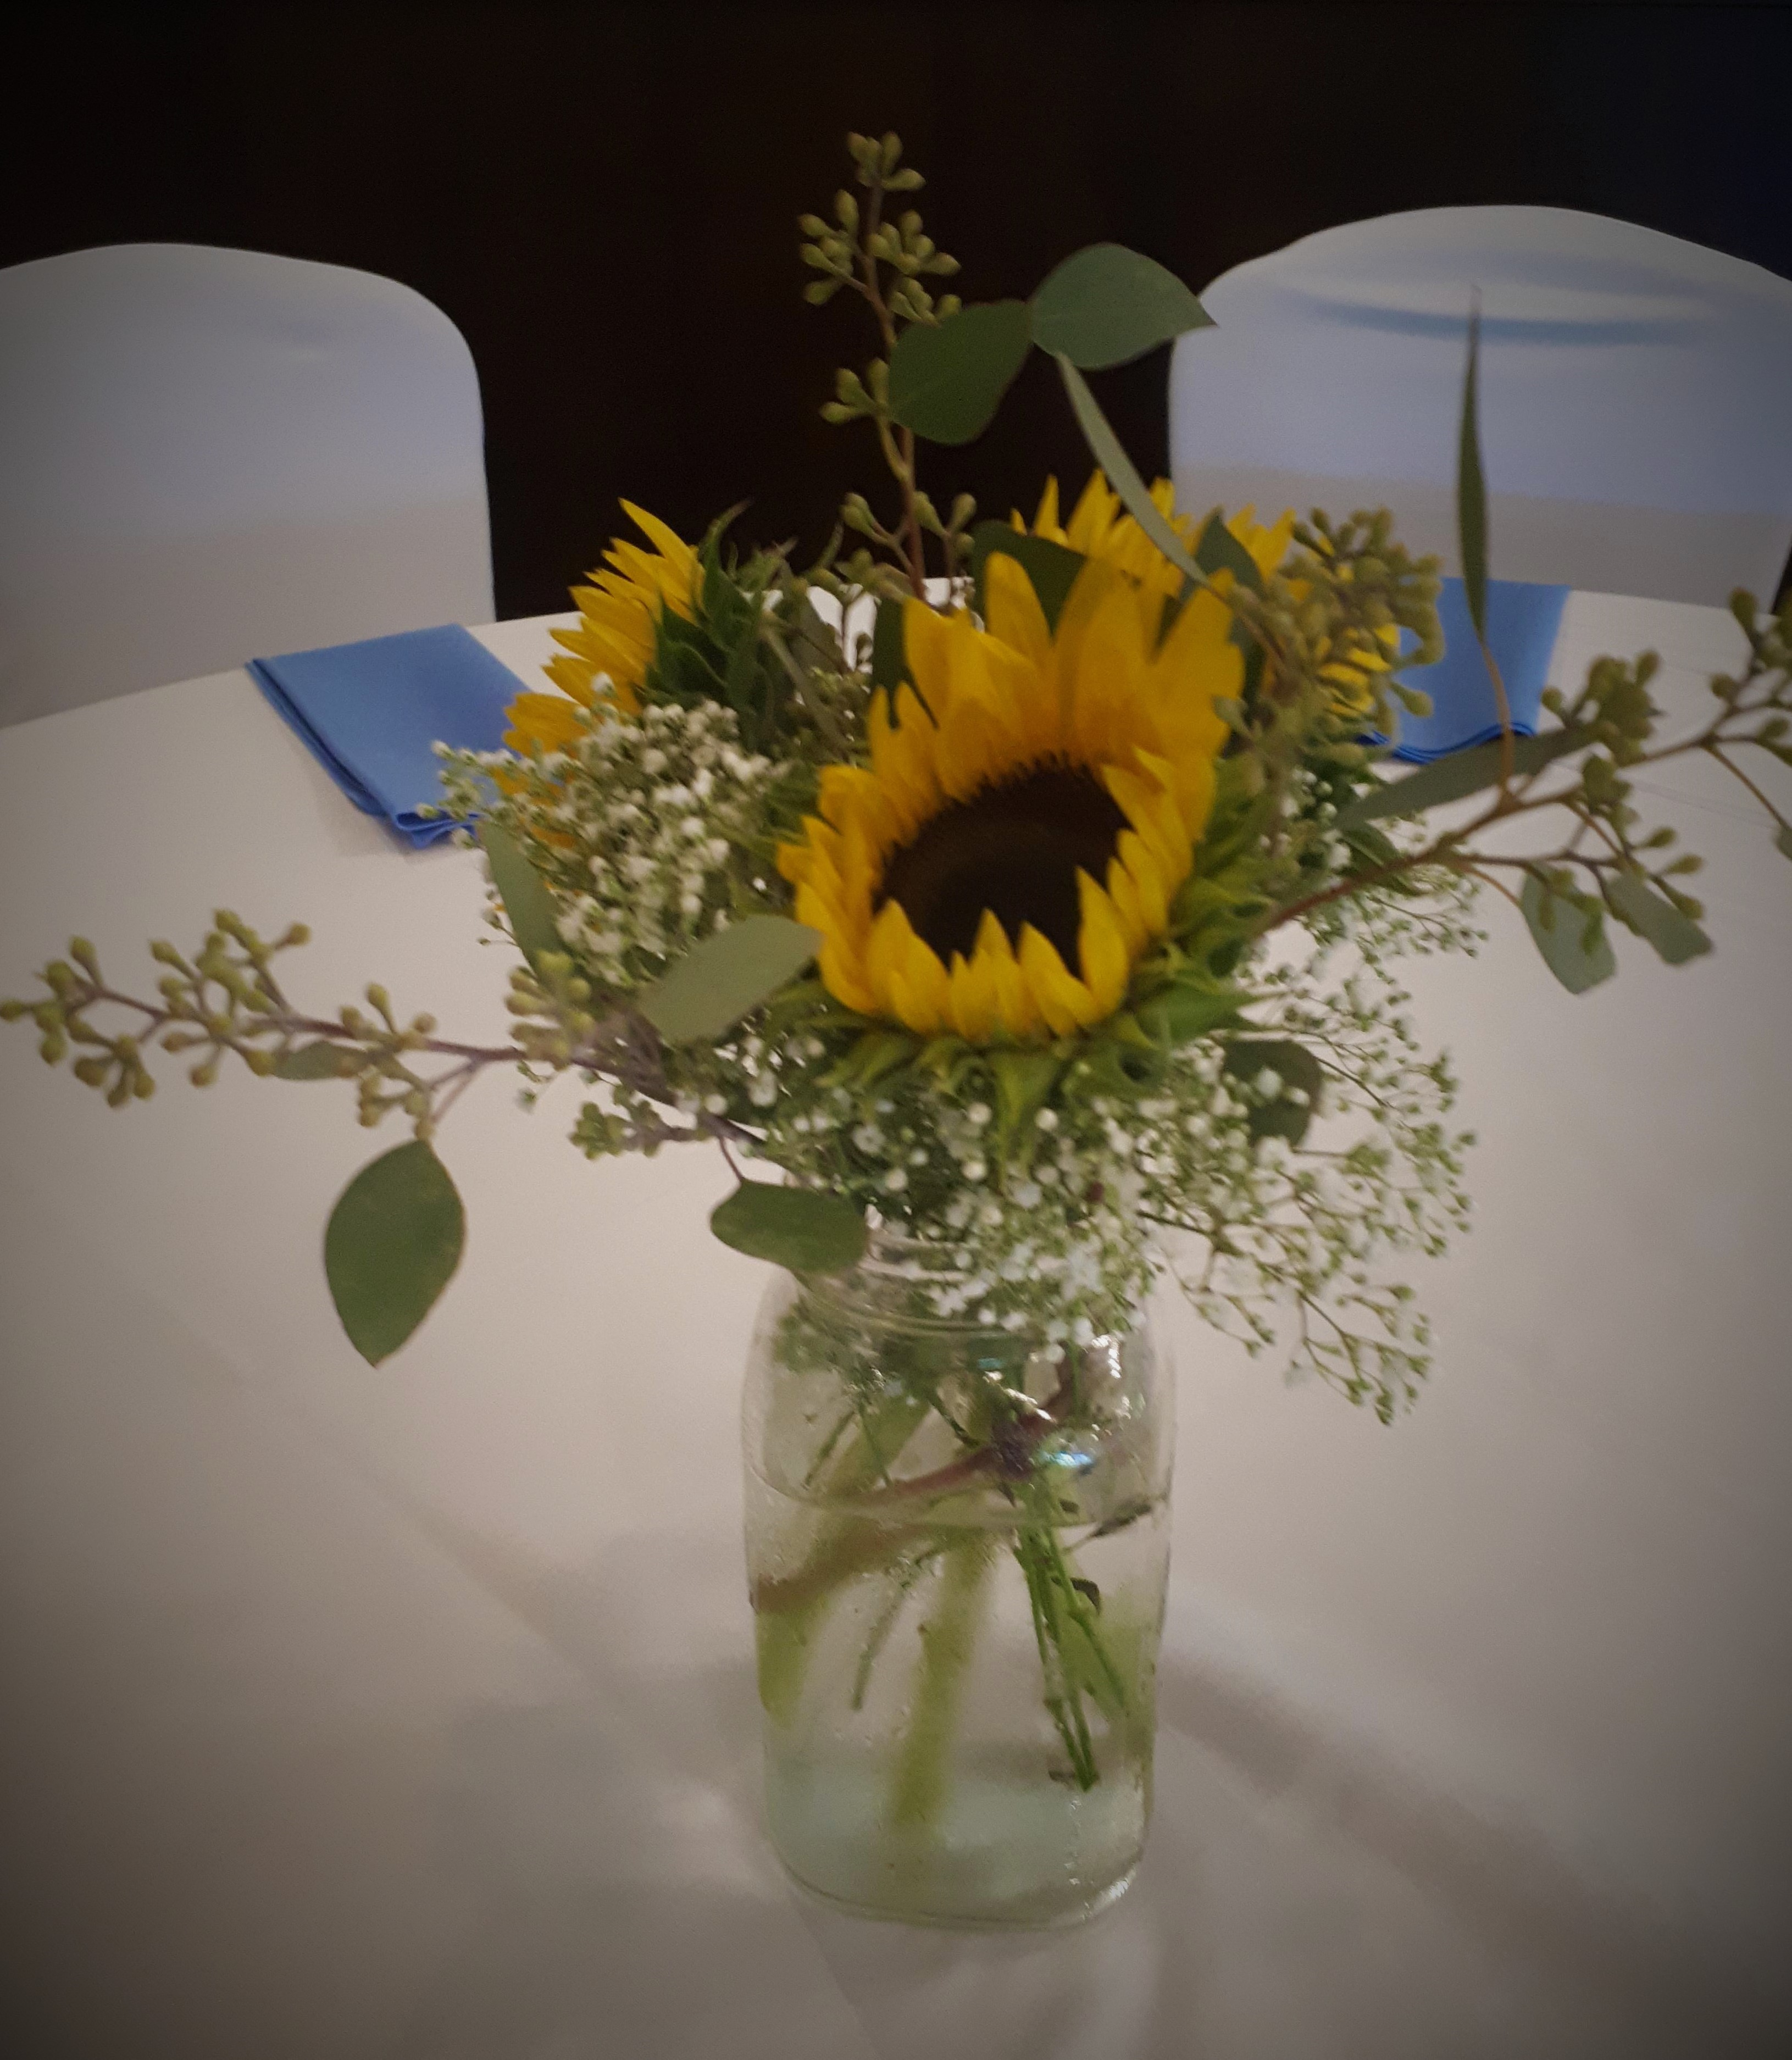 Sunflower_centrepiece_with_accents_ydpj9m.jpg